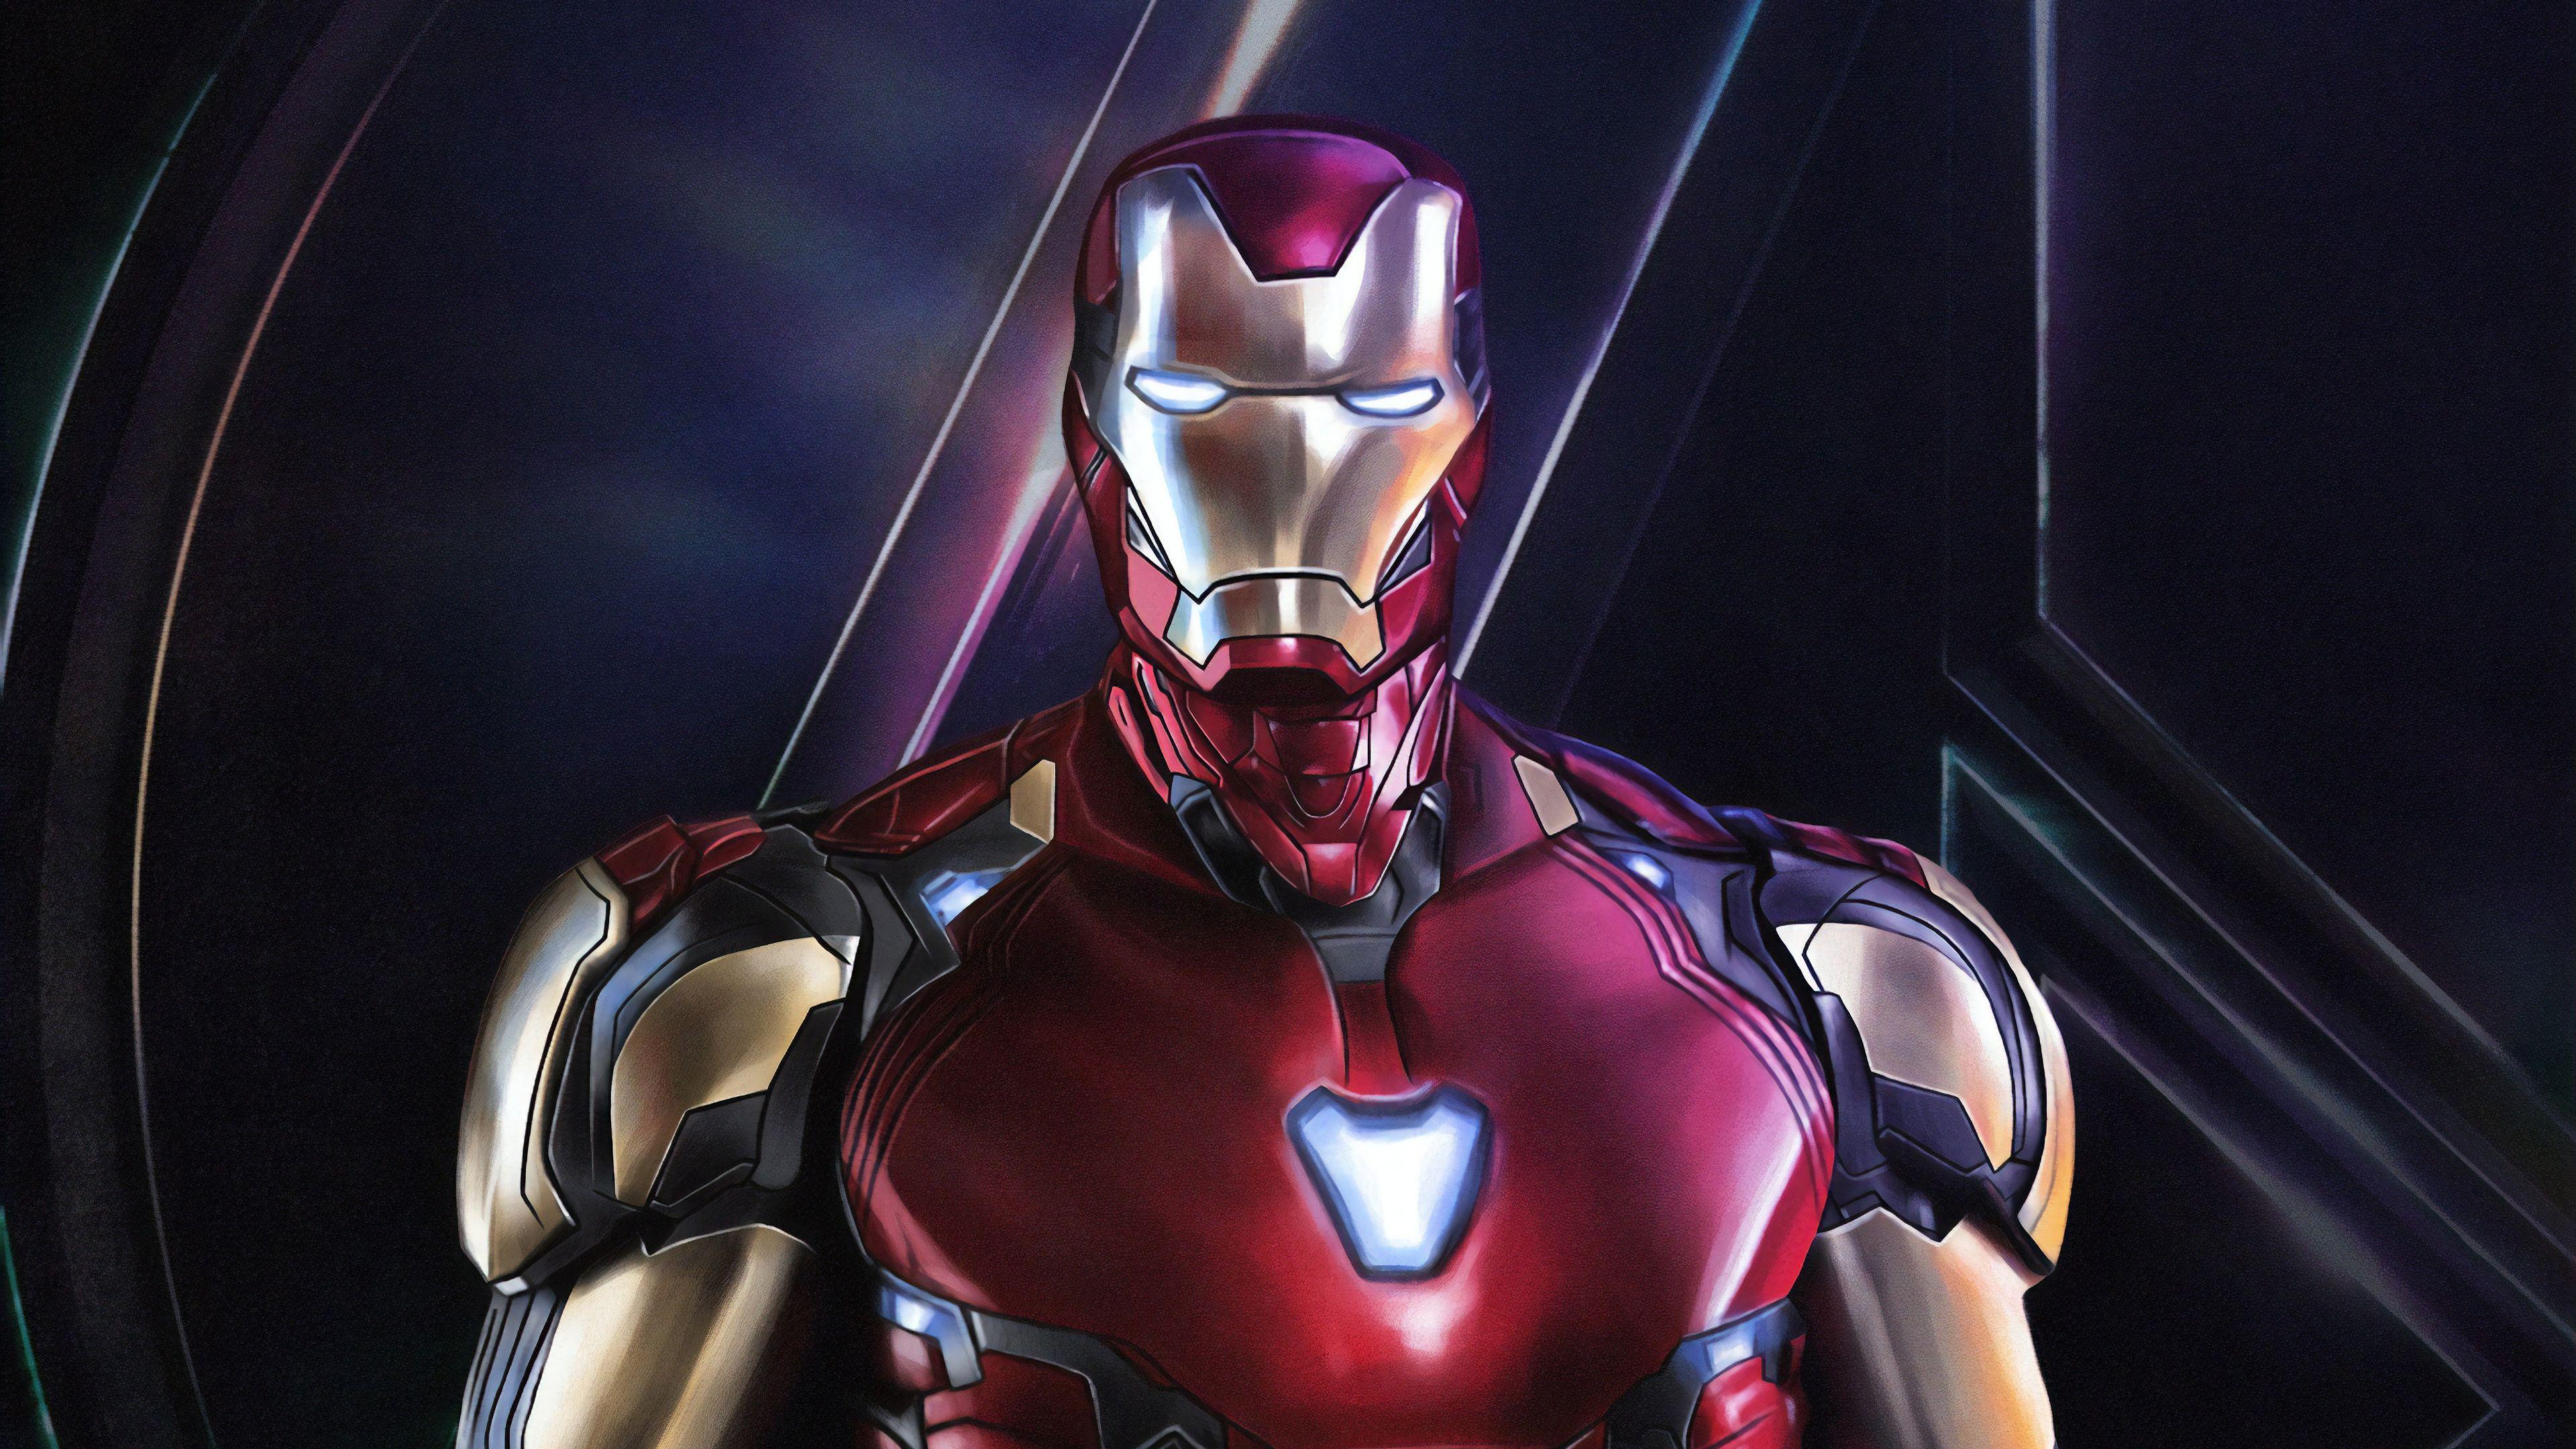 Iron Man Endgame Wallpaper Download Hd